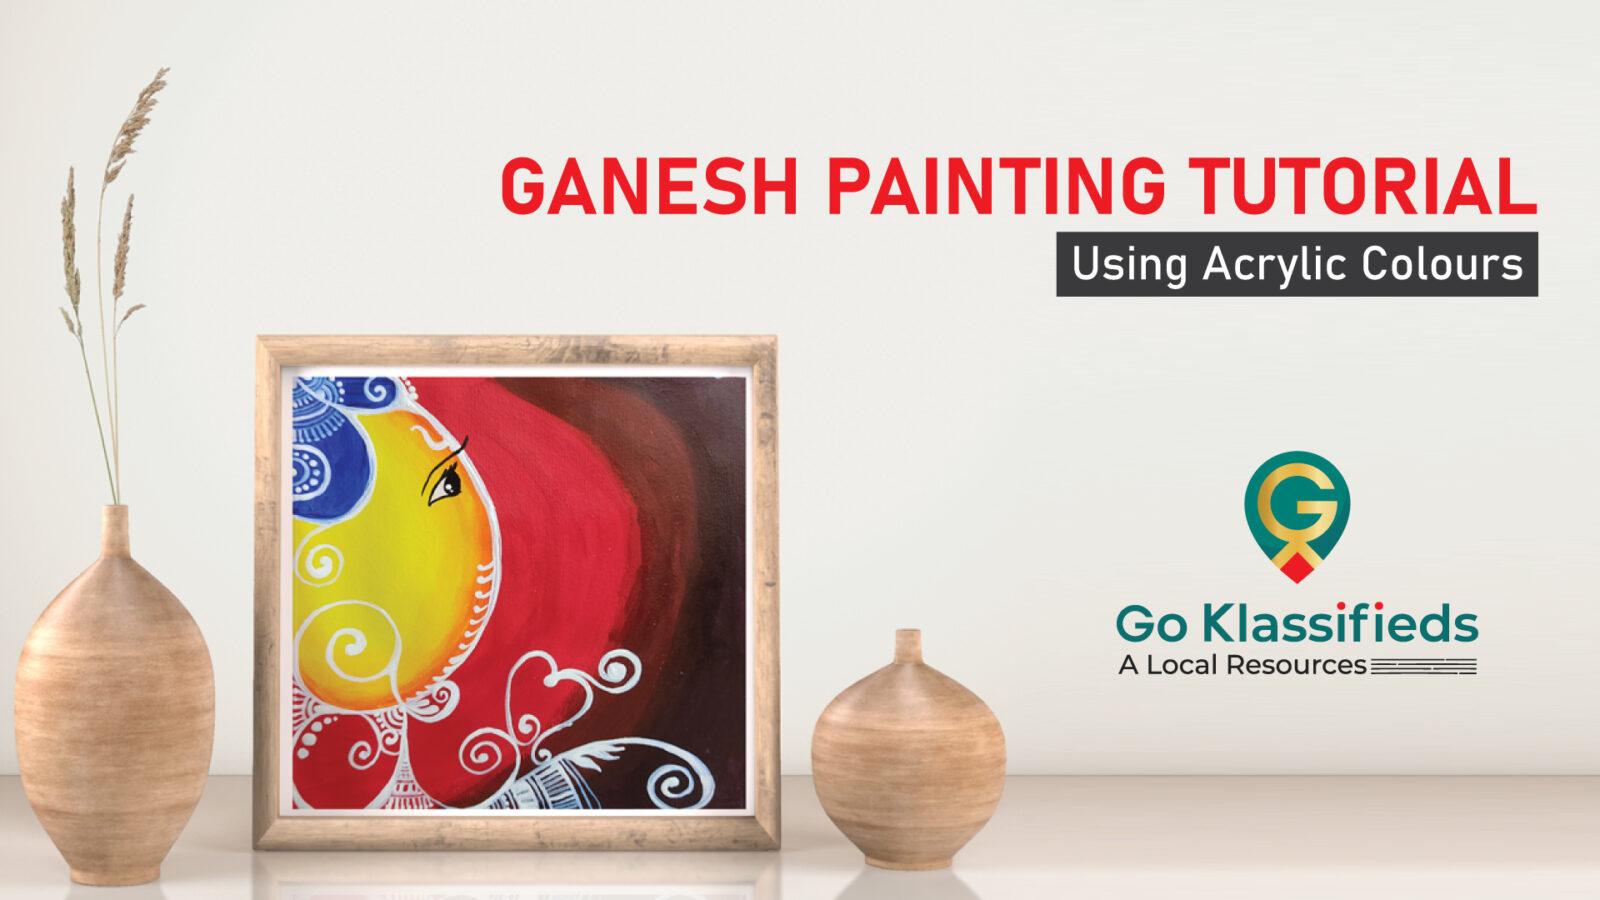 Ganesh Painting Tutorial